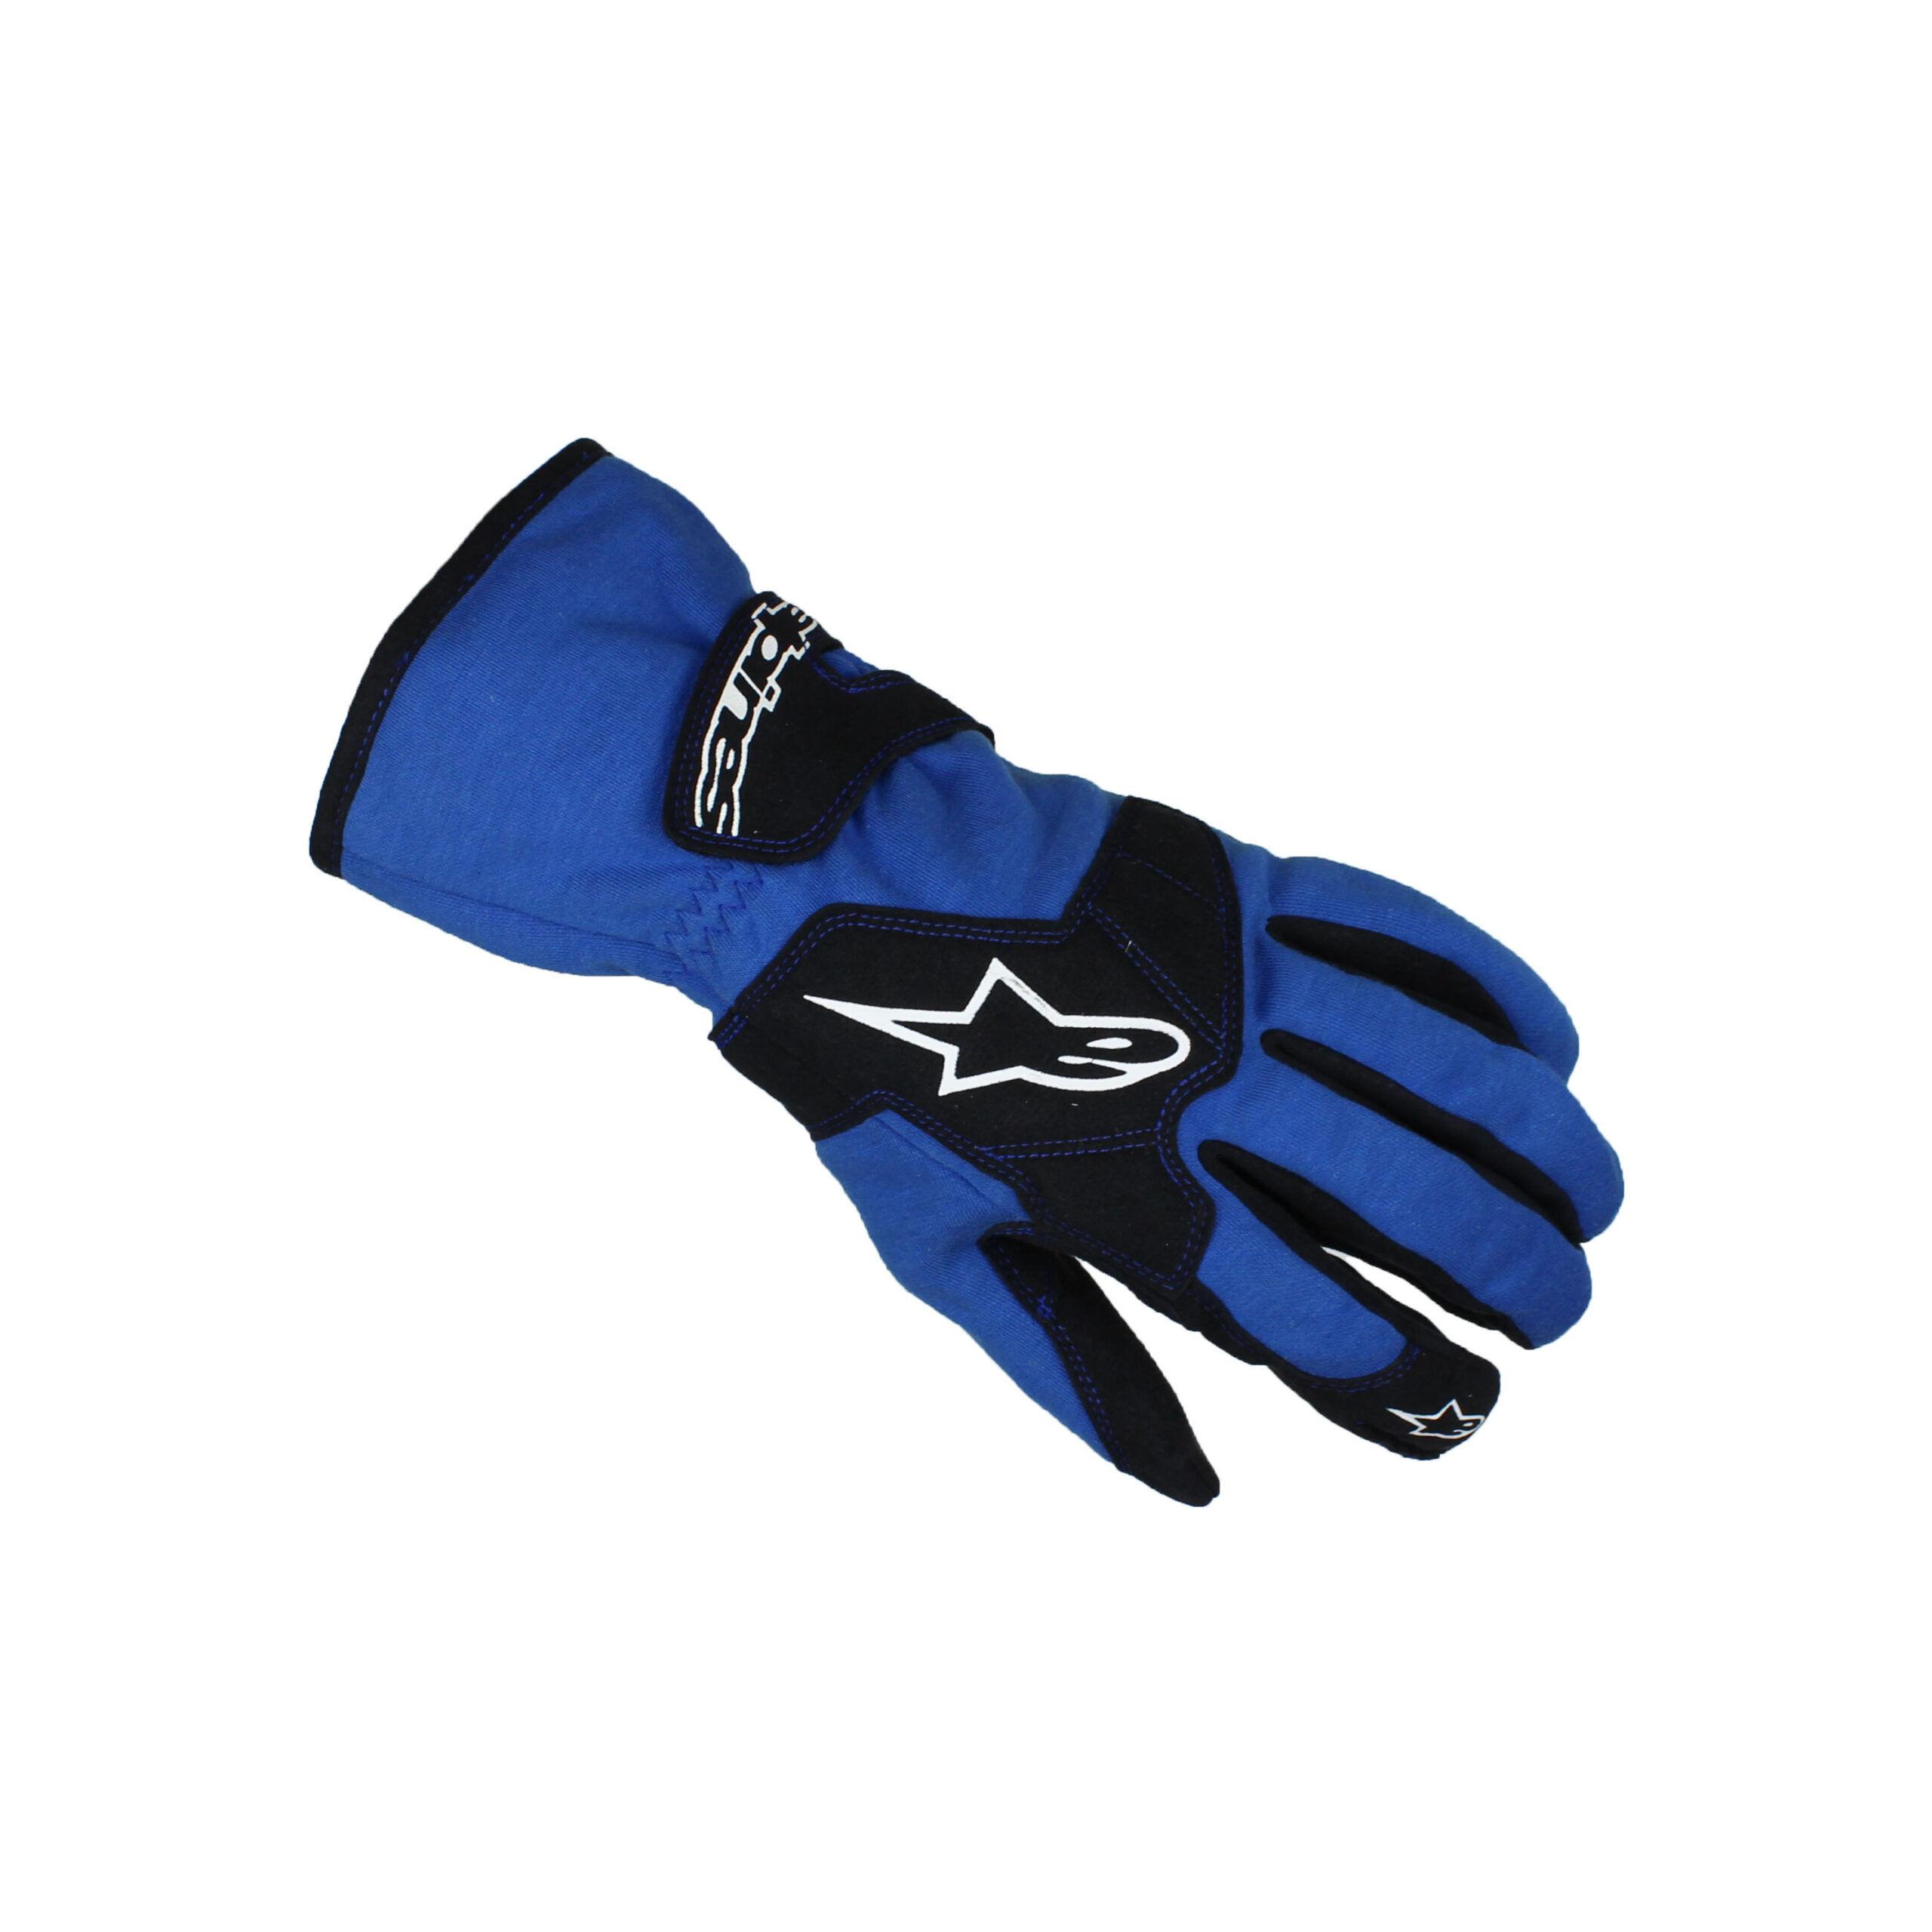 Alpinestars TECH 1-K Karting Gloves Blue/Black